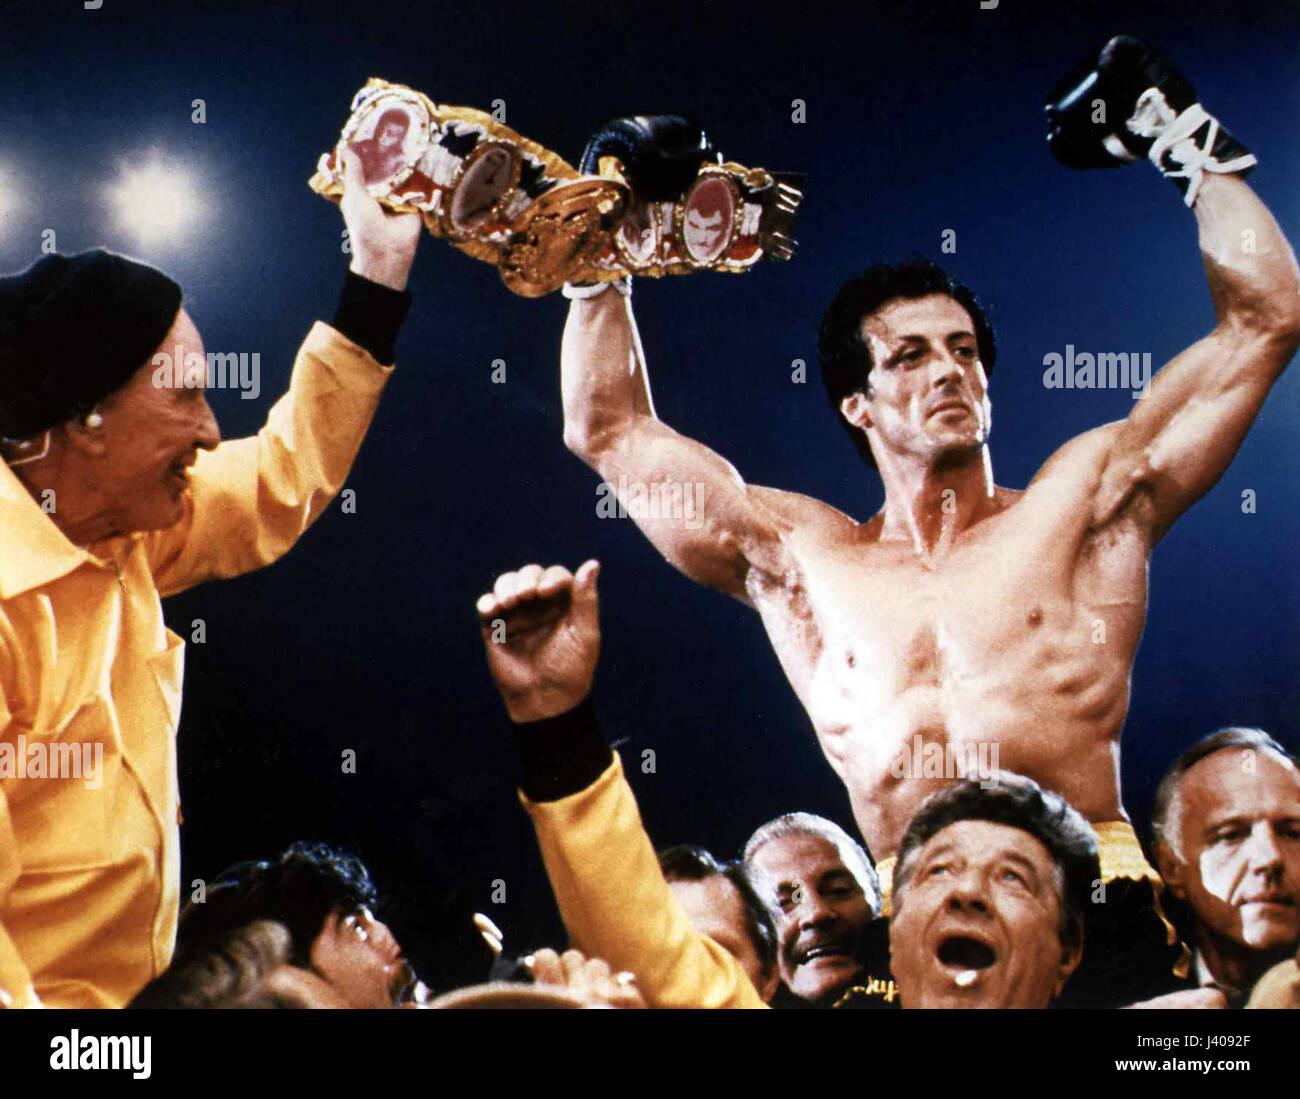 Rocky III, aka: Das Auge des Tigers, USA 1982, Regie: Sylvester Stallone, Darsteller: Burgess Meredith, Sylvester - Stock Image